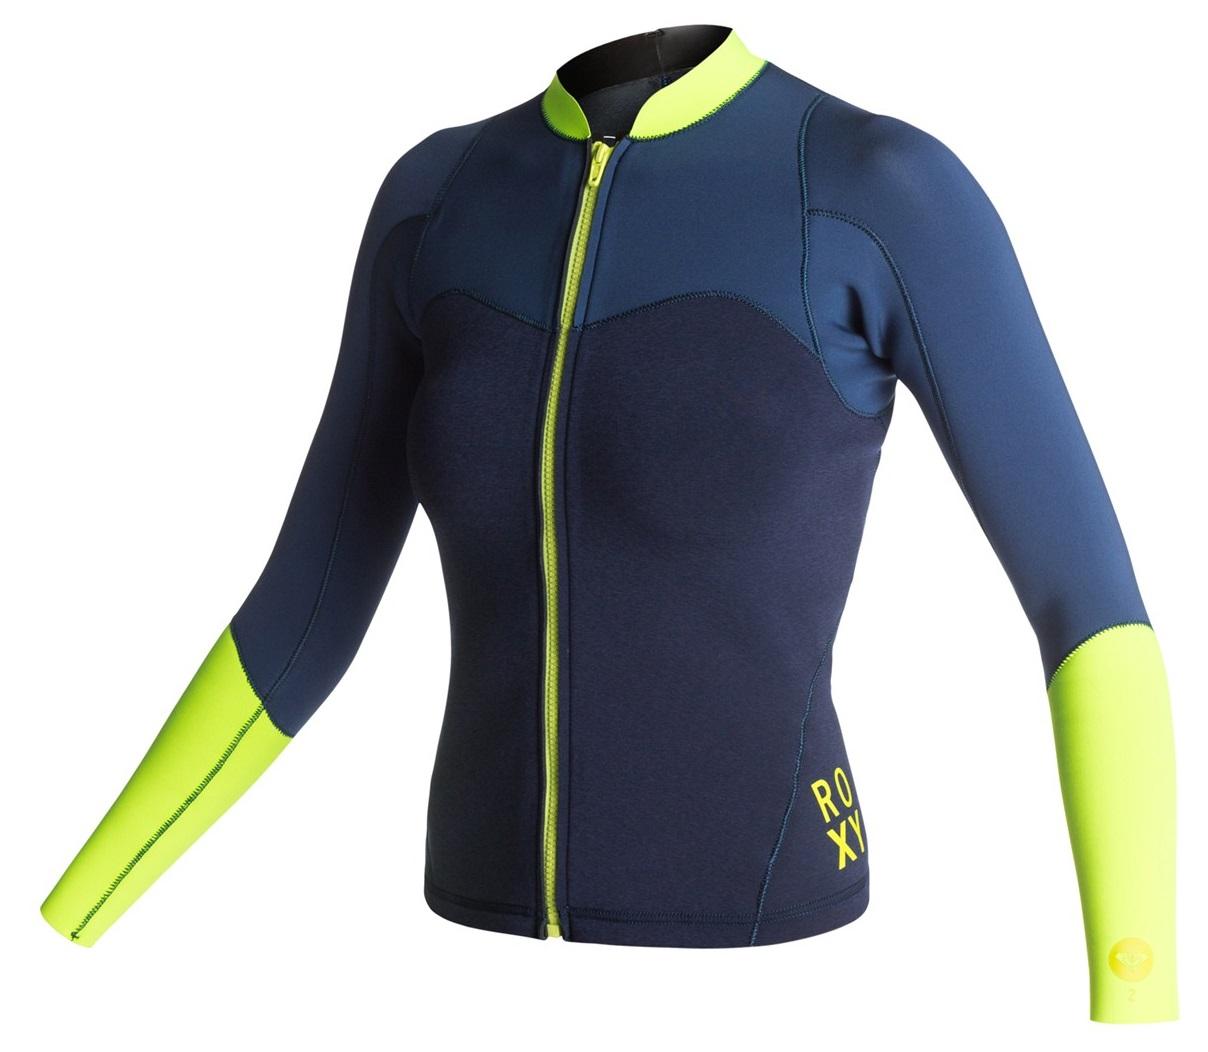 Roxy XY Women s 2mm Front Zip Neoprene Jacket Blue Yellow ARJW803006-XBBY  b97dc5973